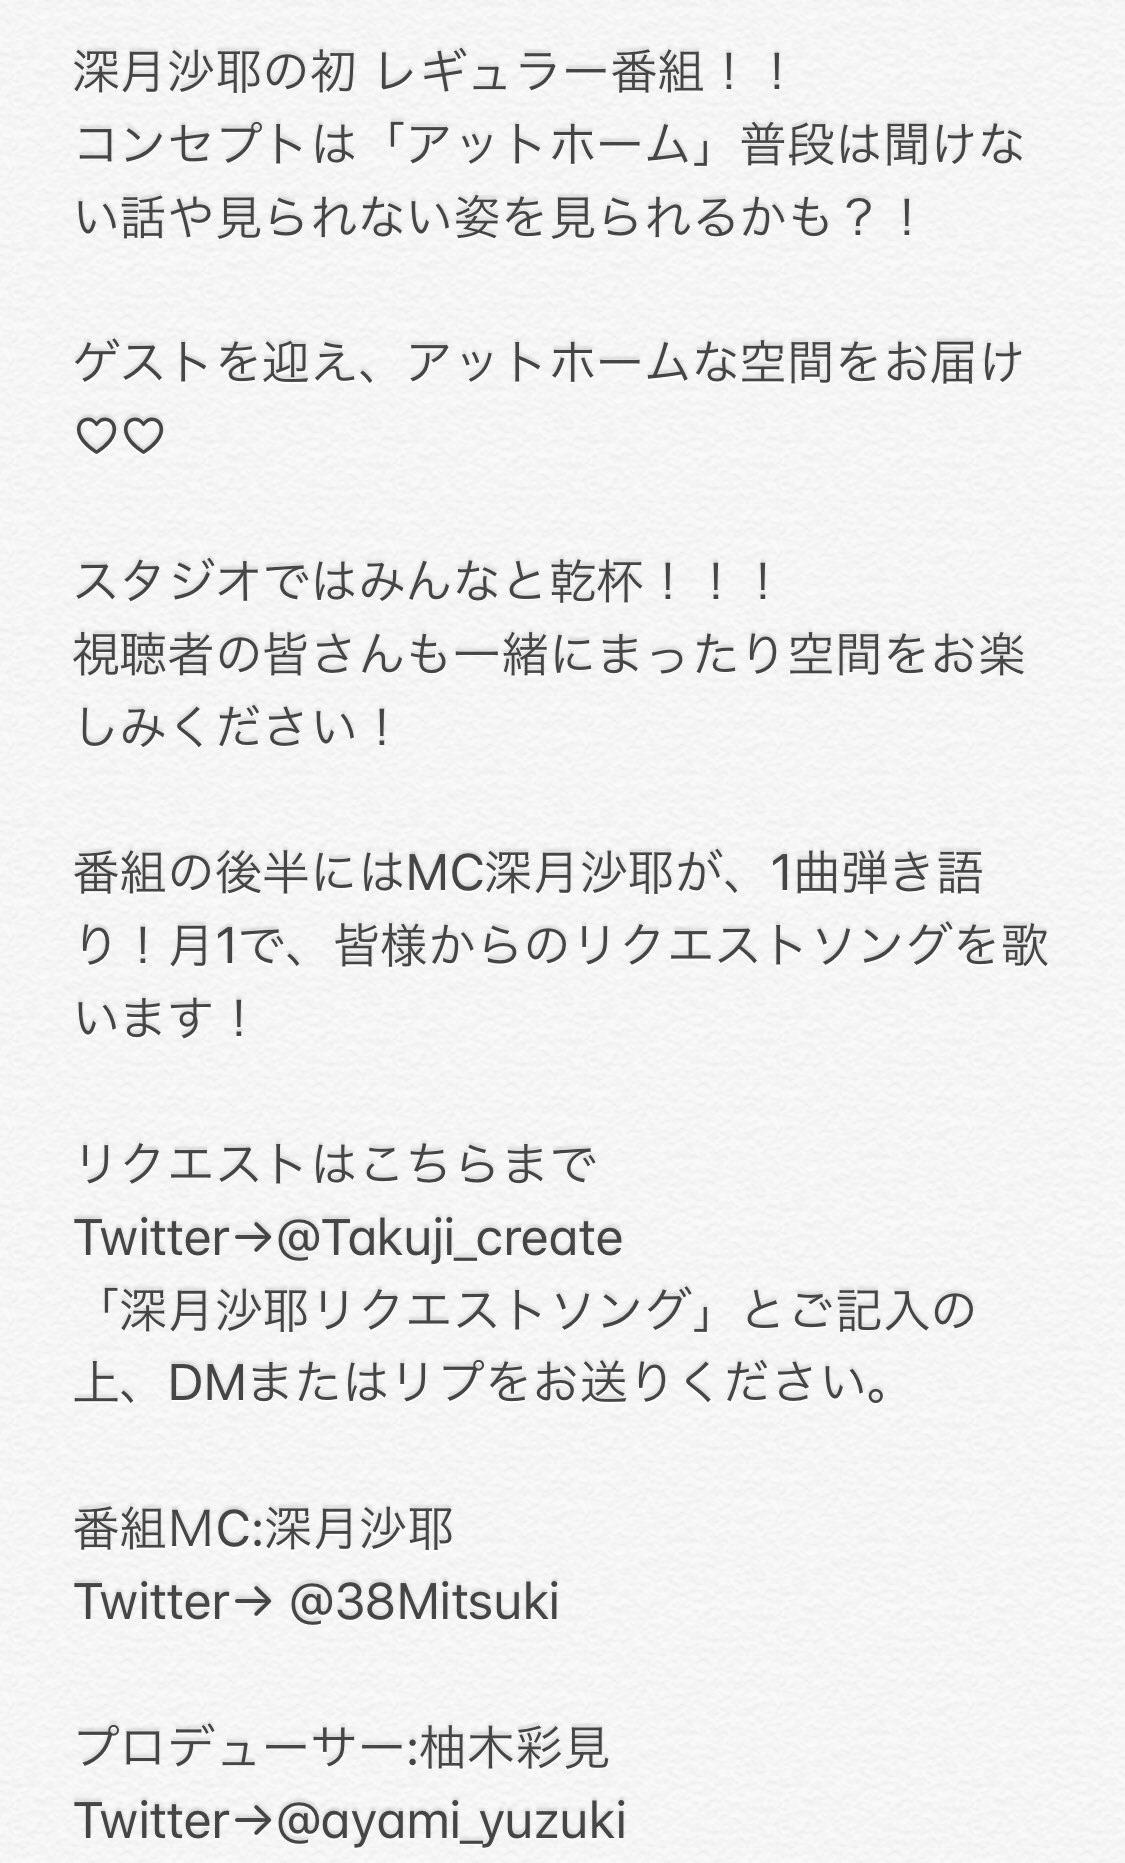 f:id:mitsuki_3838:20200520192925j:image